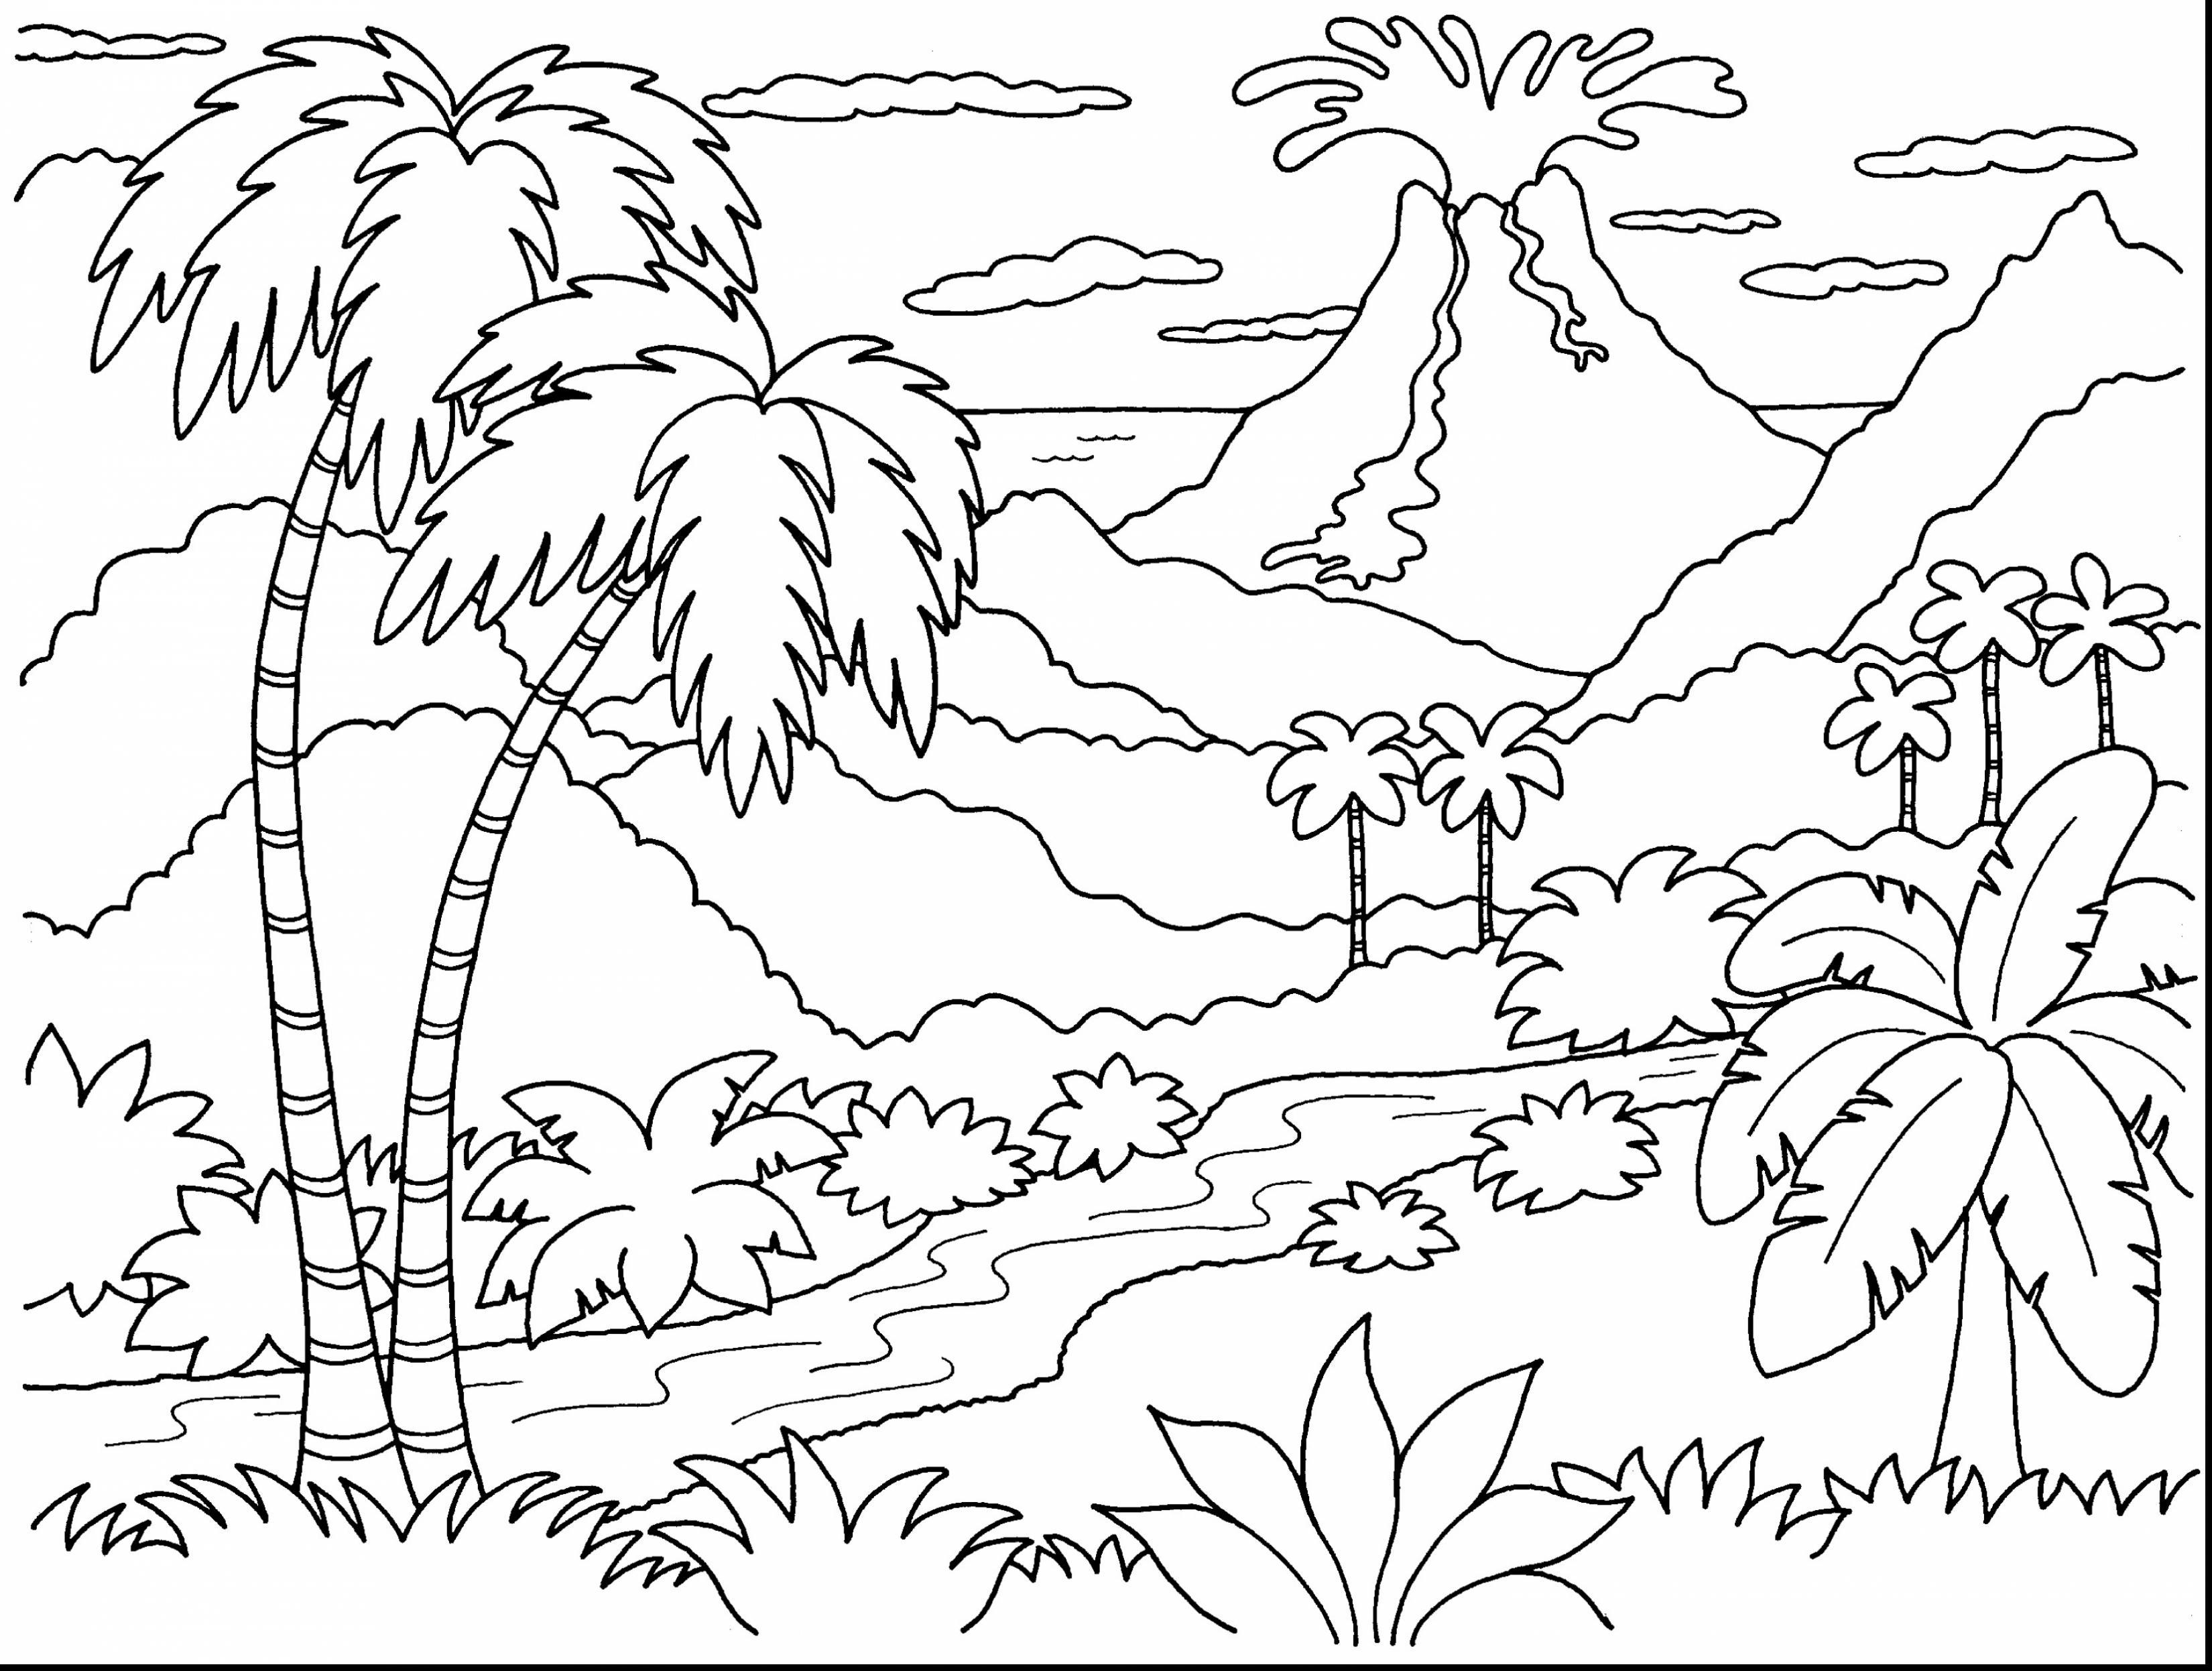 Vulcano Island coloring #20, Download drawings